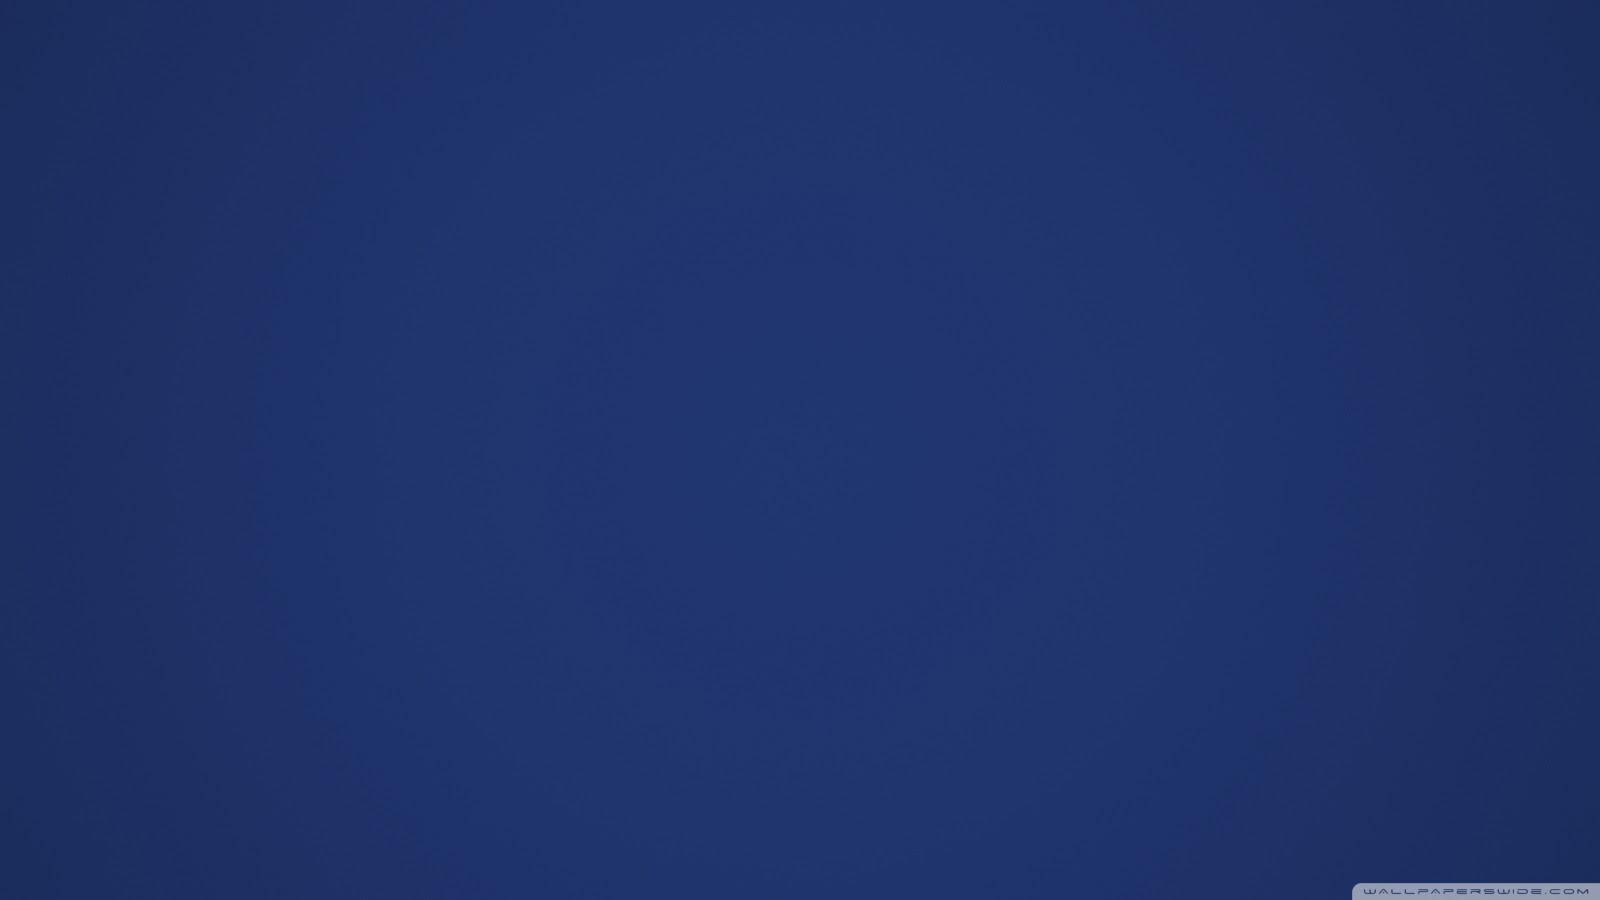 Blue Hd Wallpapers Download Link Wallpapers